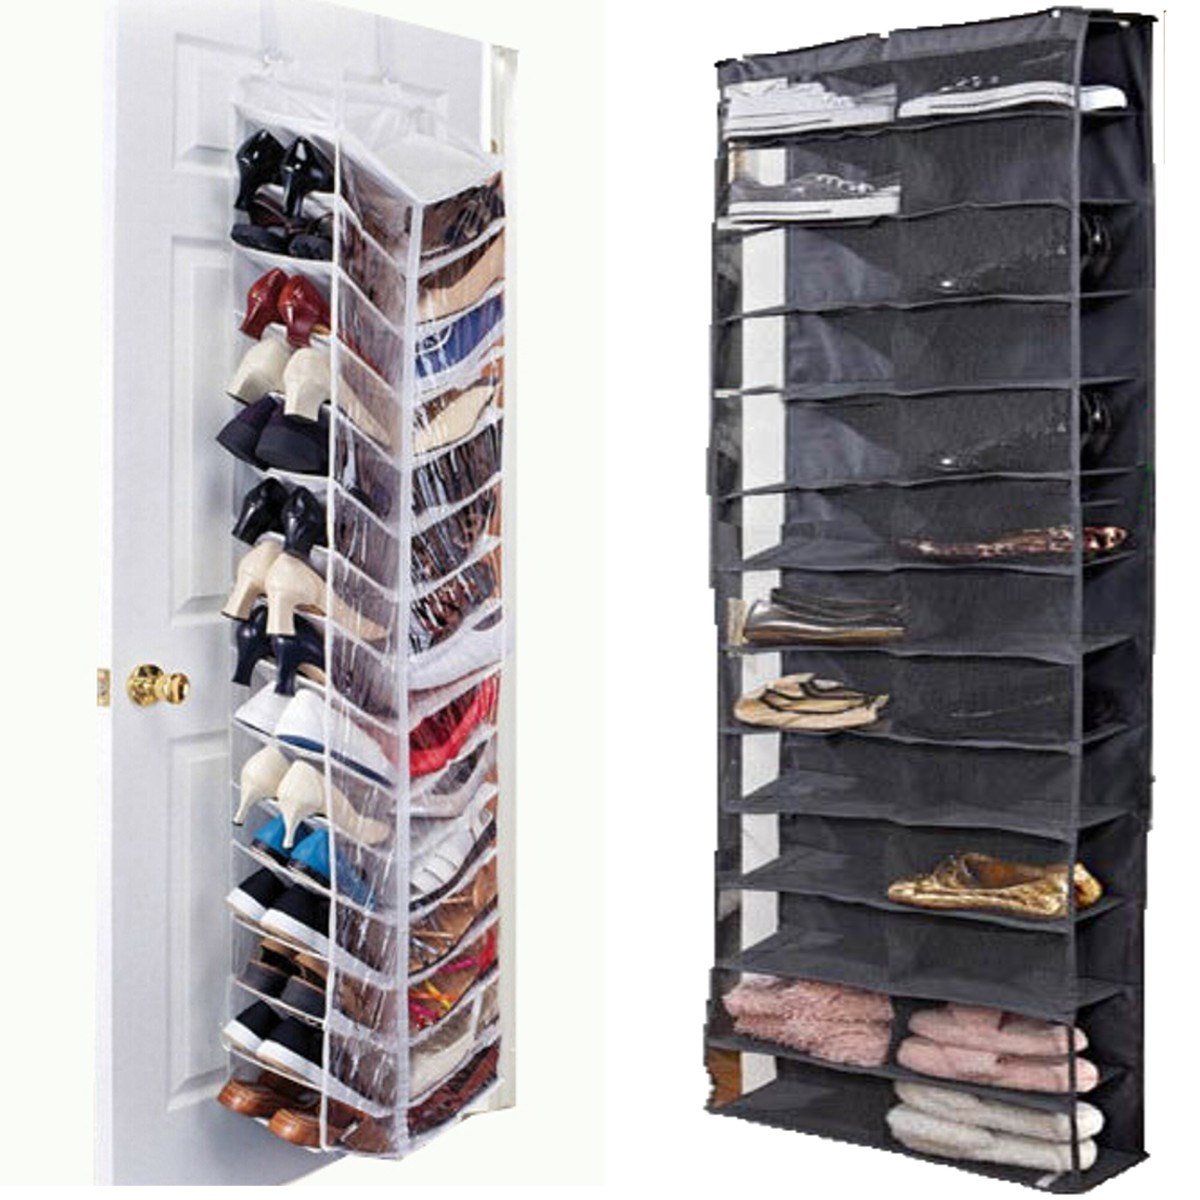 Space Saving Shoe Rack Online Get Cheap Door Shoe Storage Aliexpresscom Alibaba Group